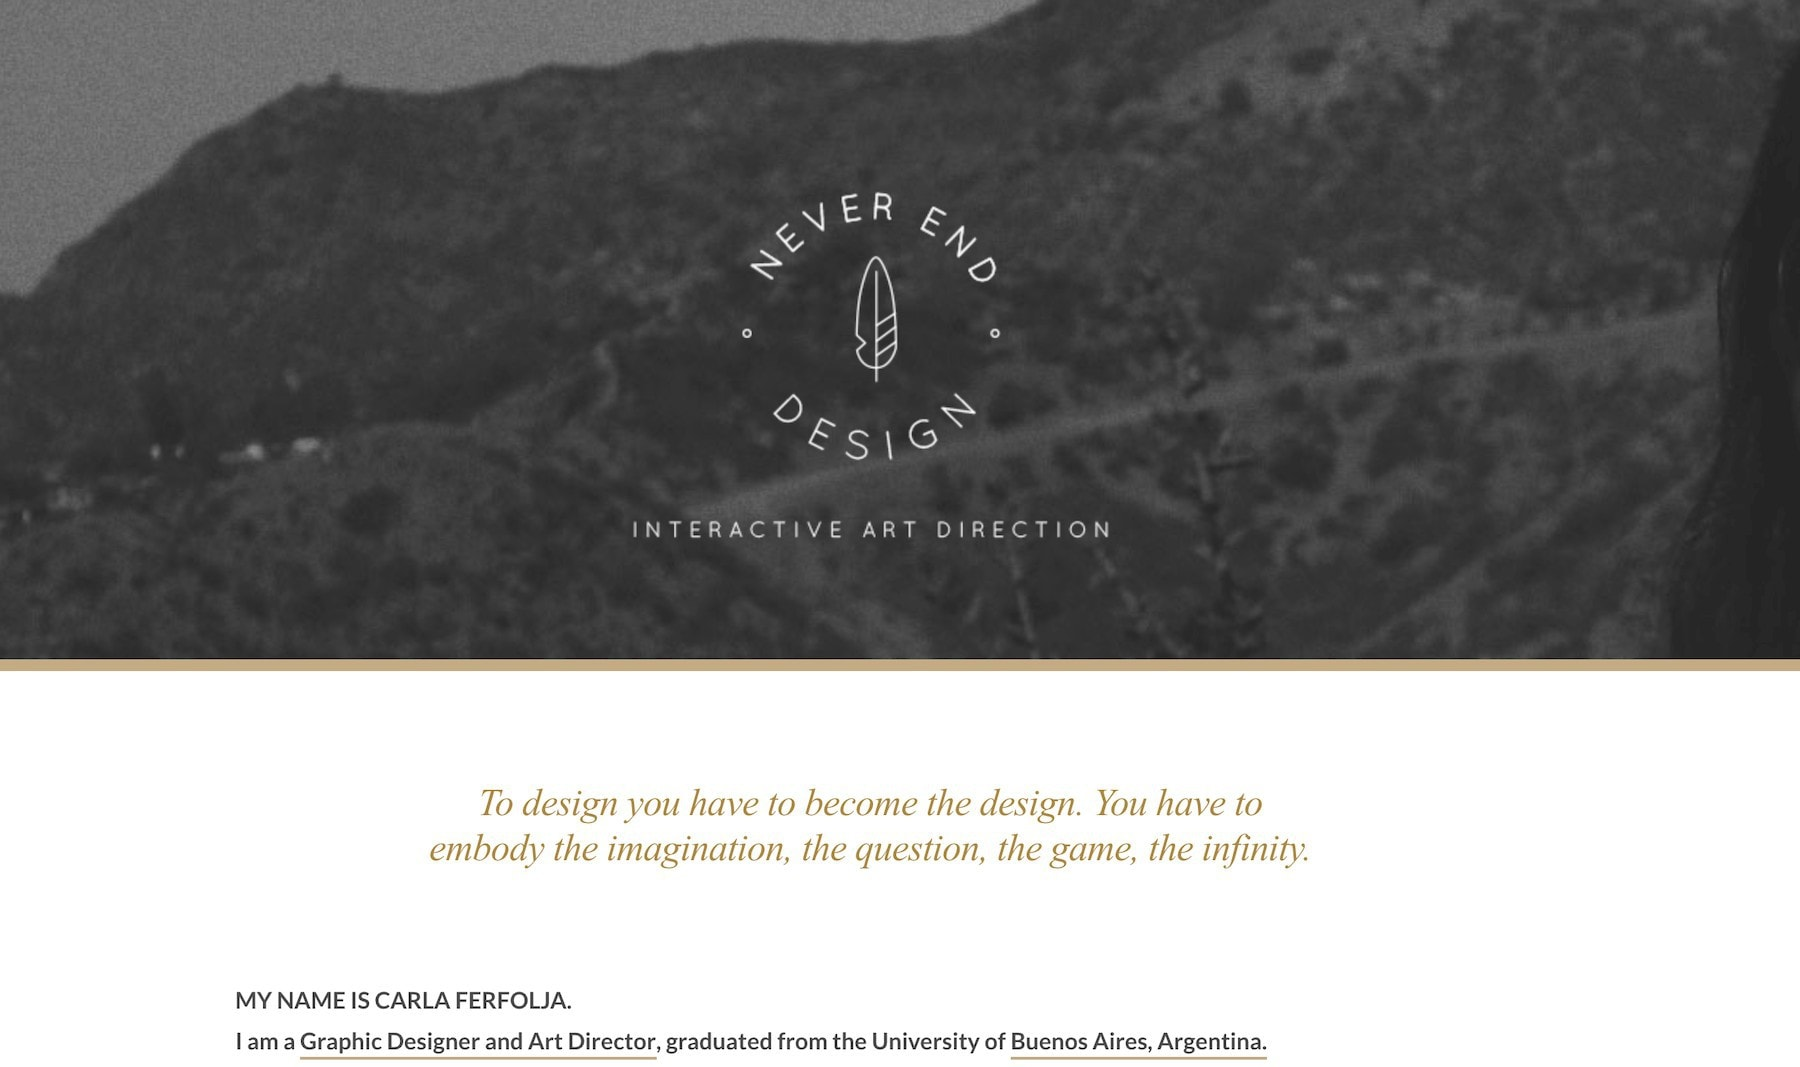 Carla Ferfolja design portfolio website freelance